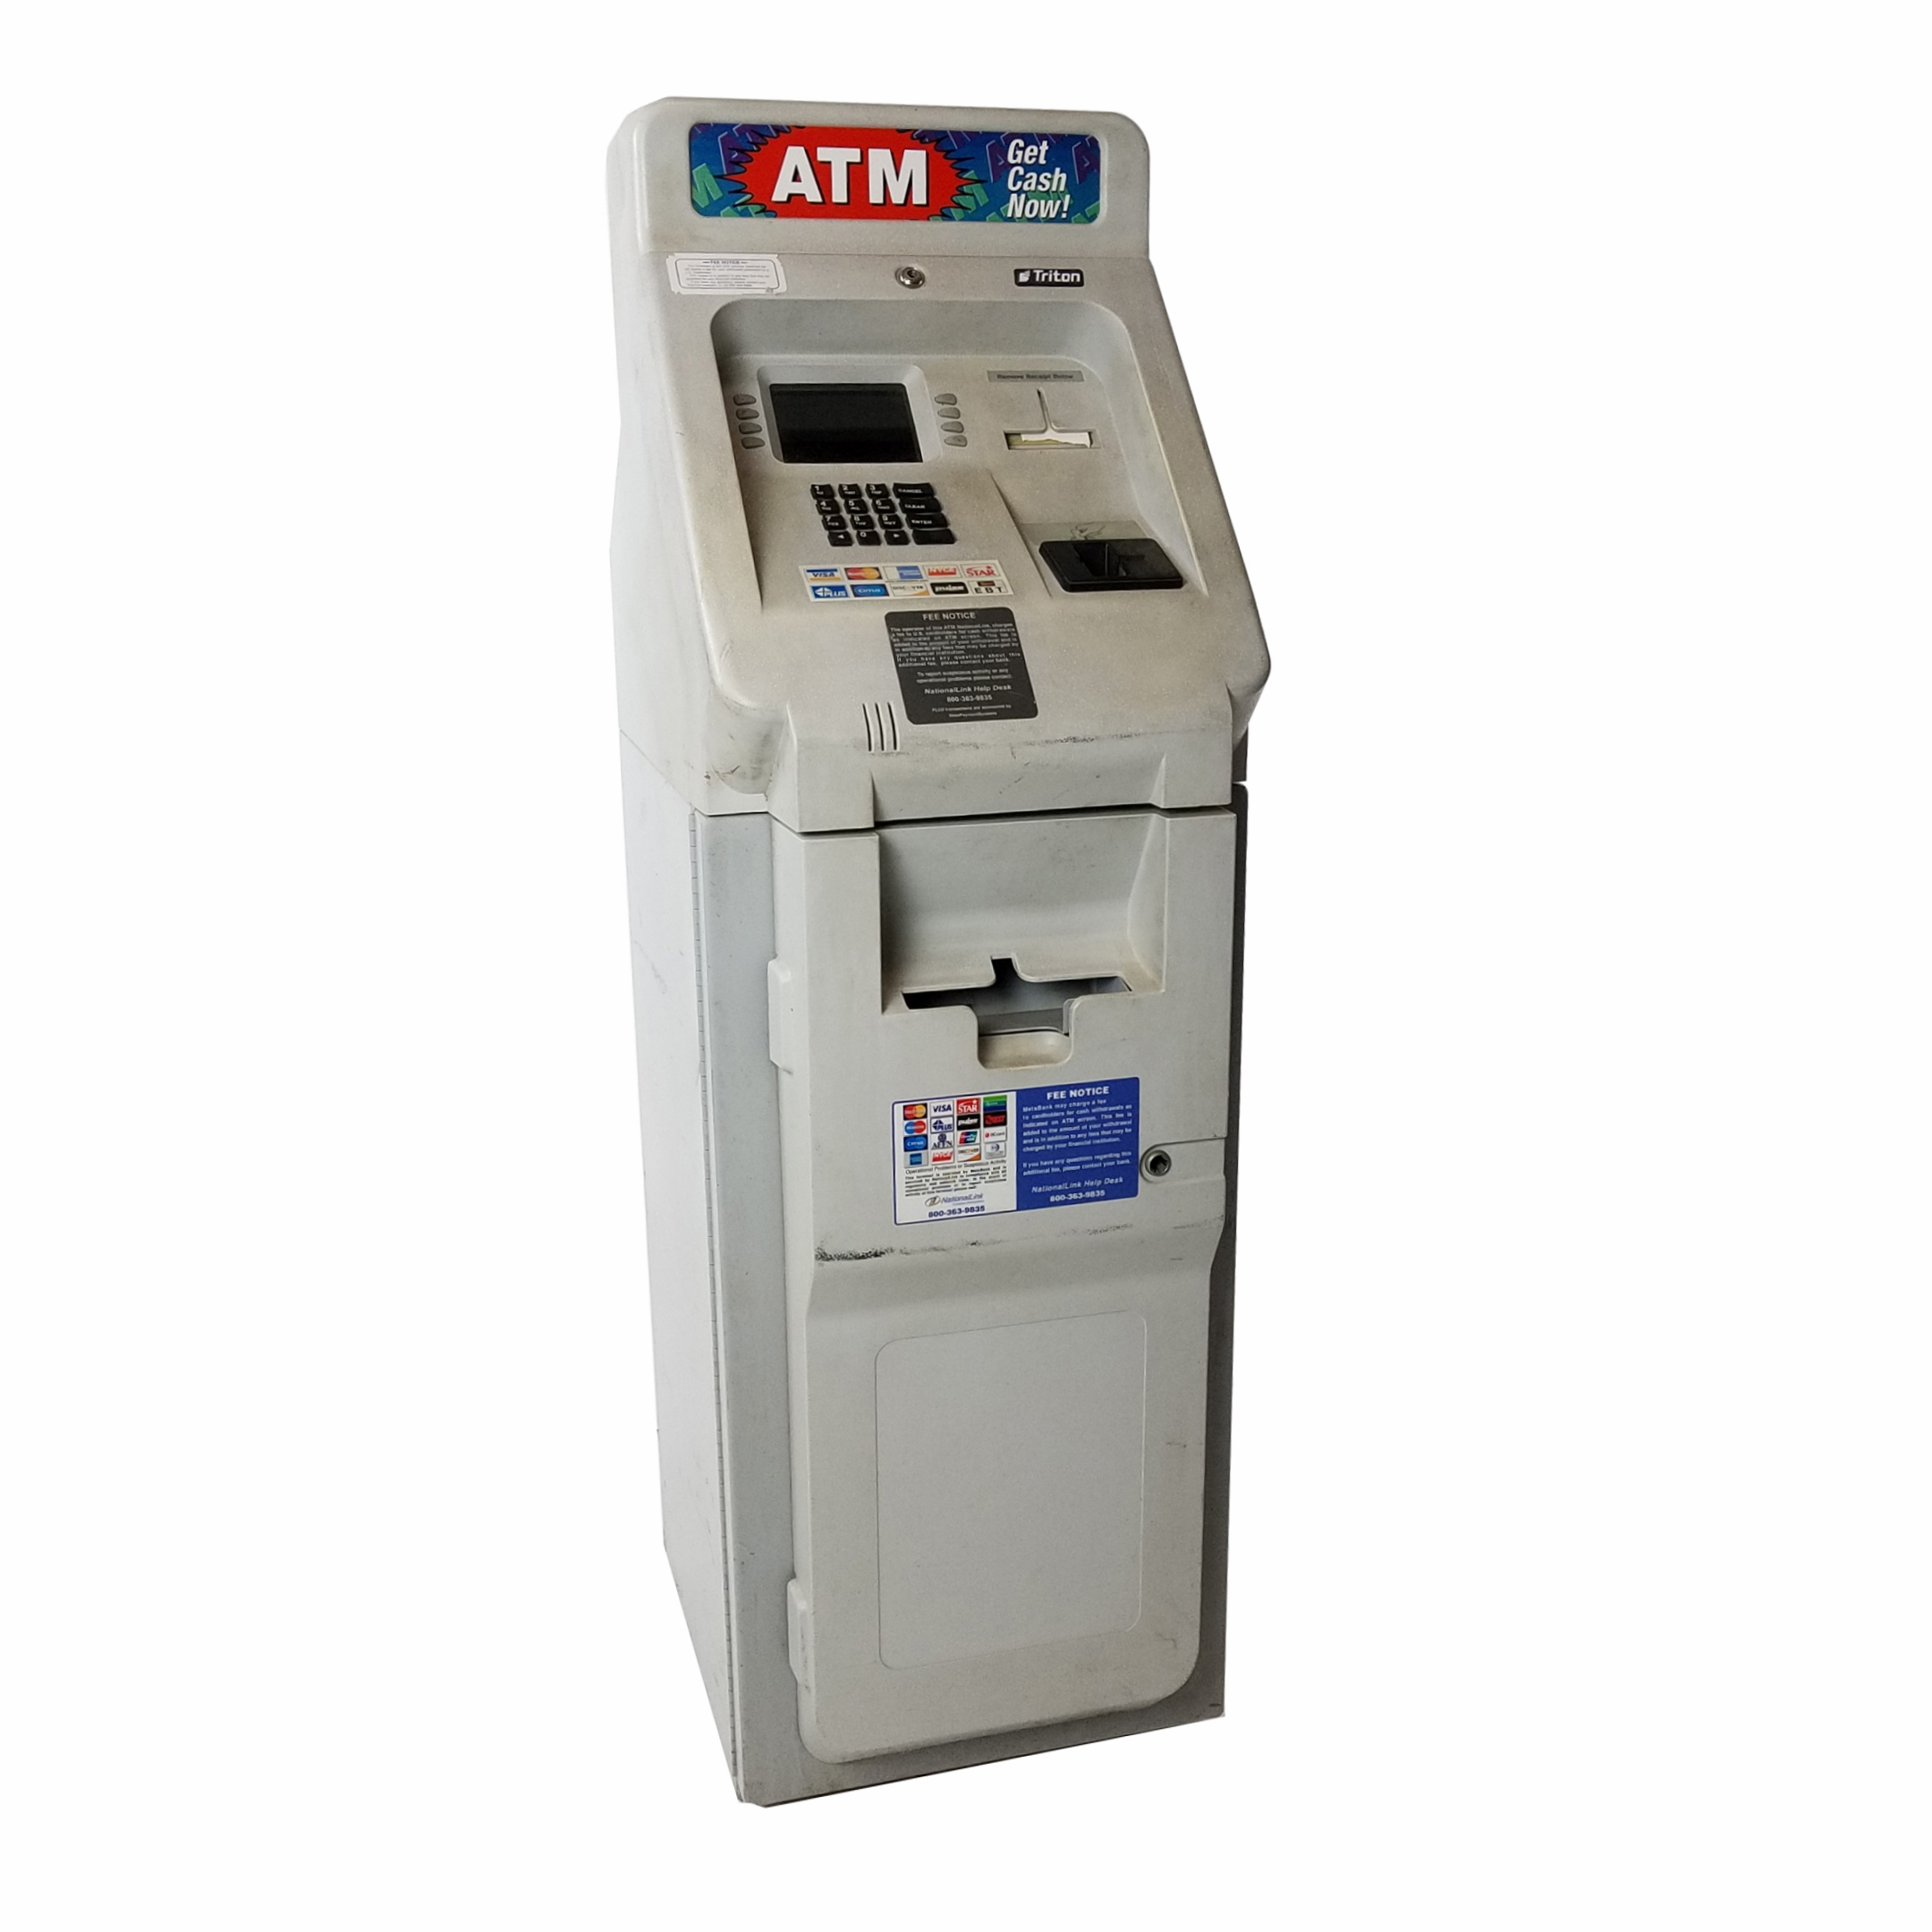 triton 9600 atm machine